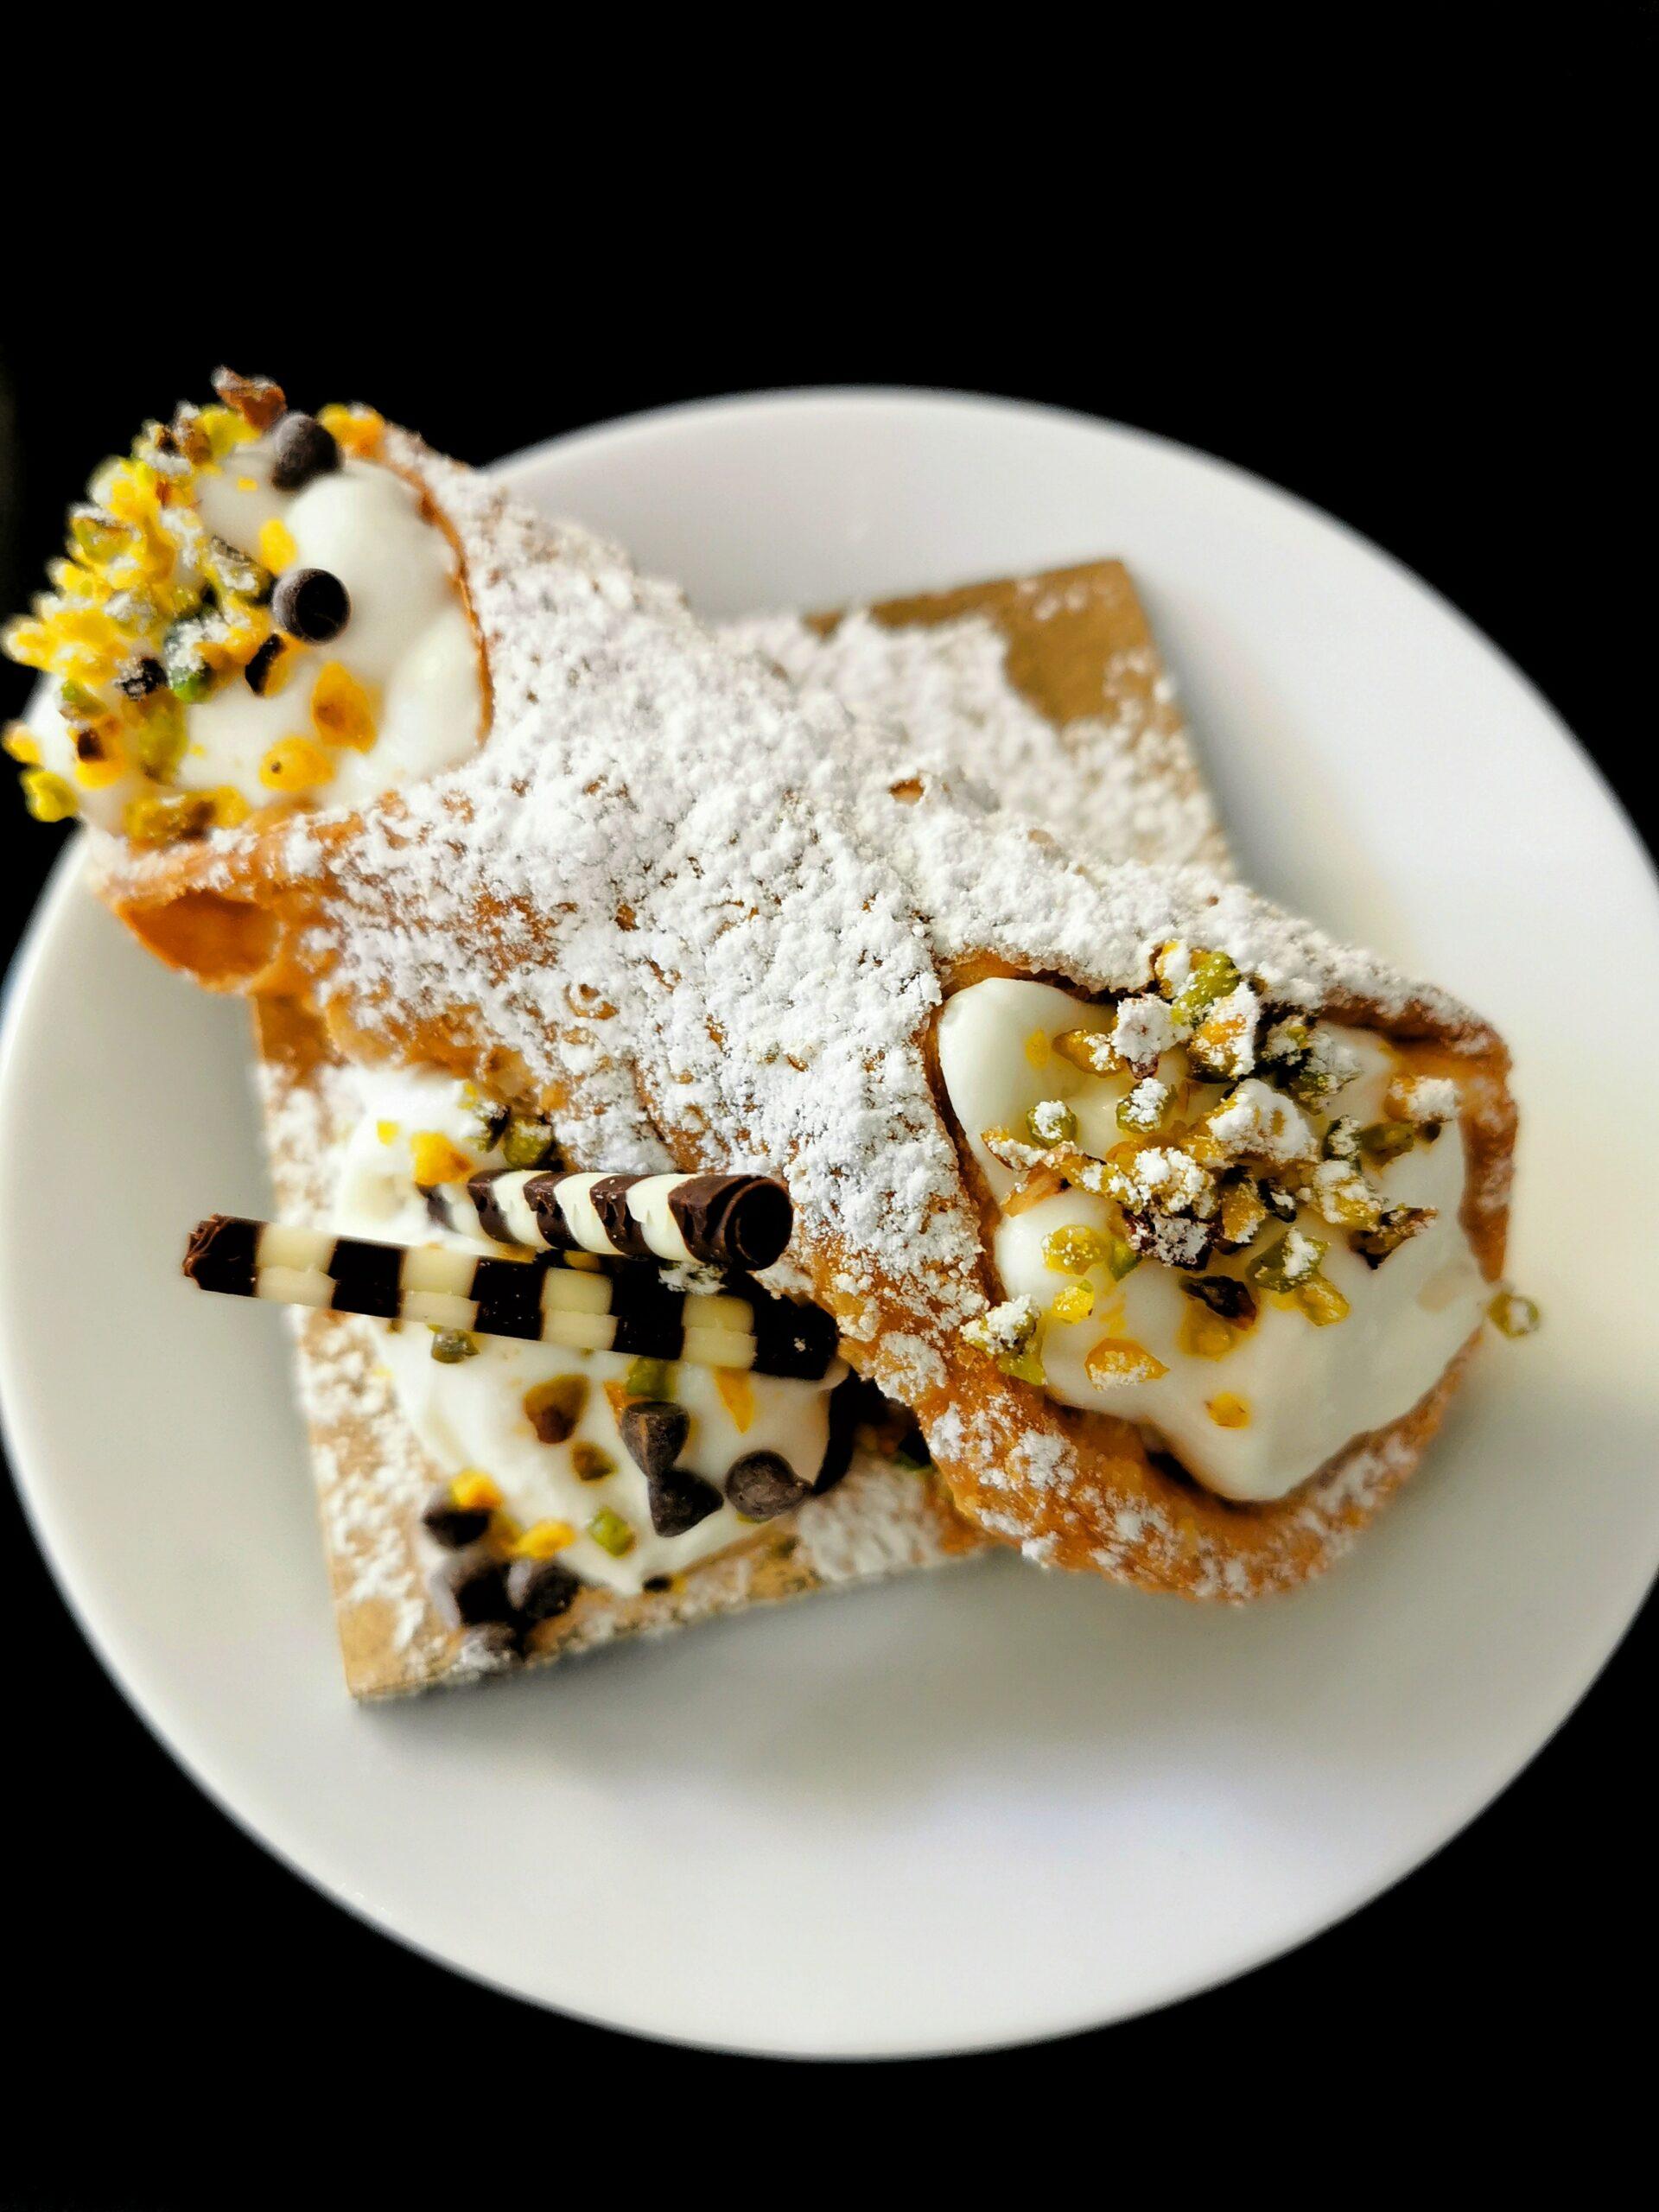 Italian Food: Canoncini